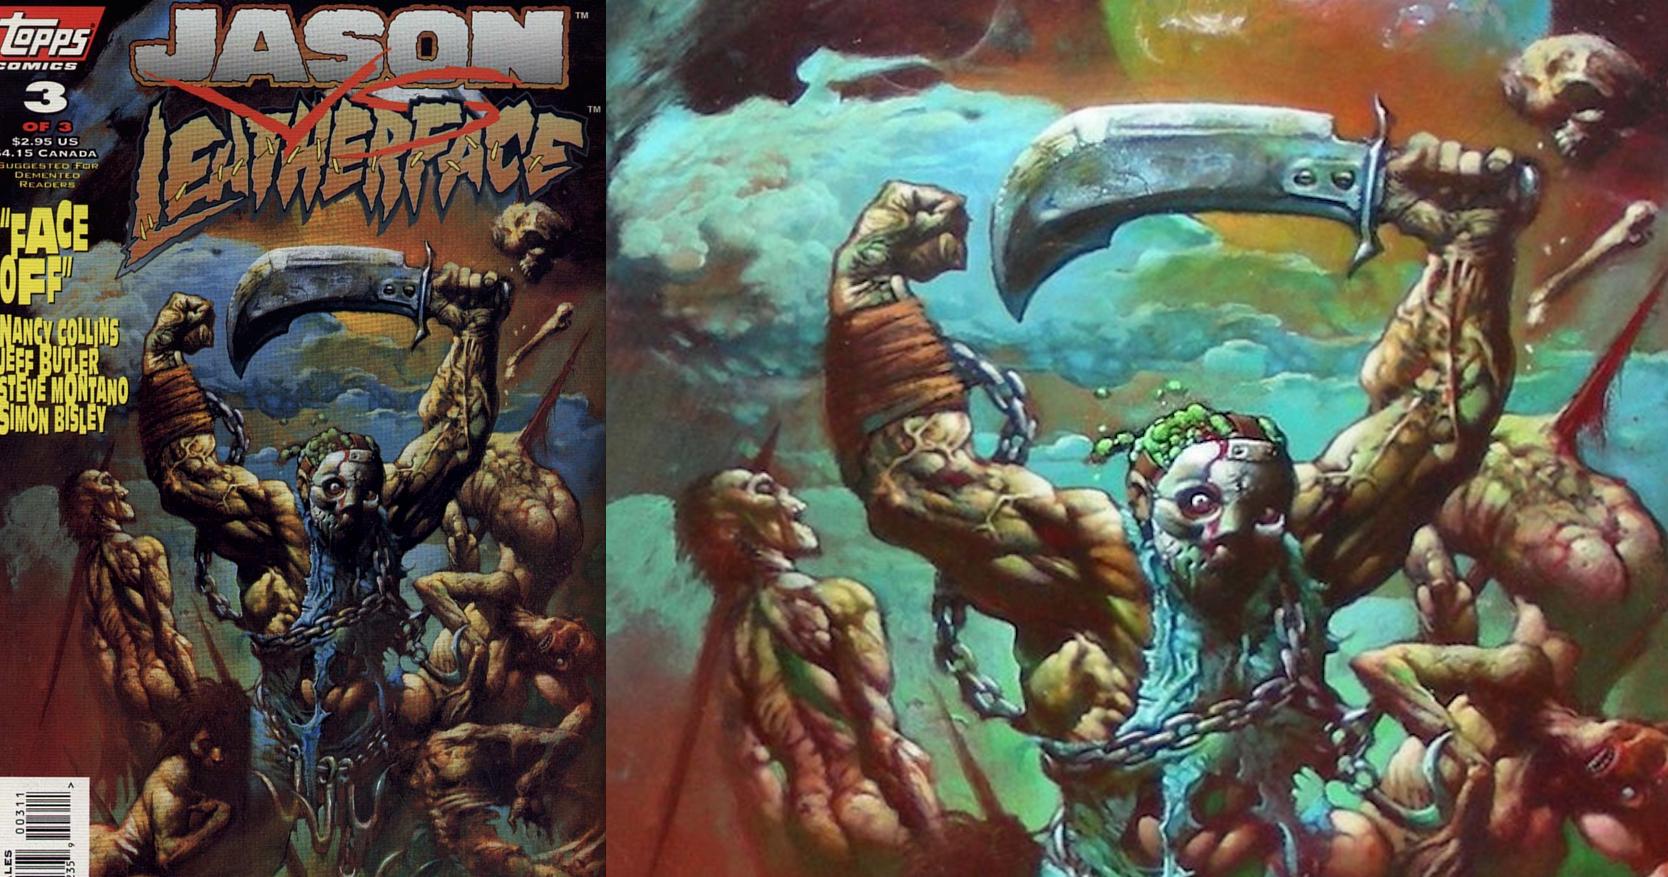 Jason Vs Leatherface 3 Bisley Cover Art